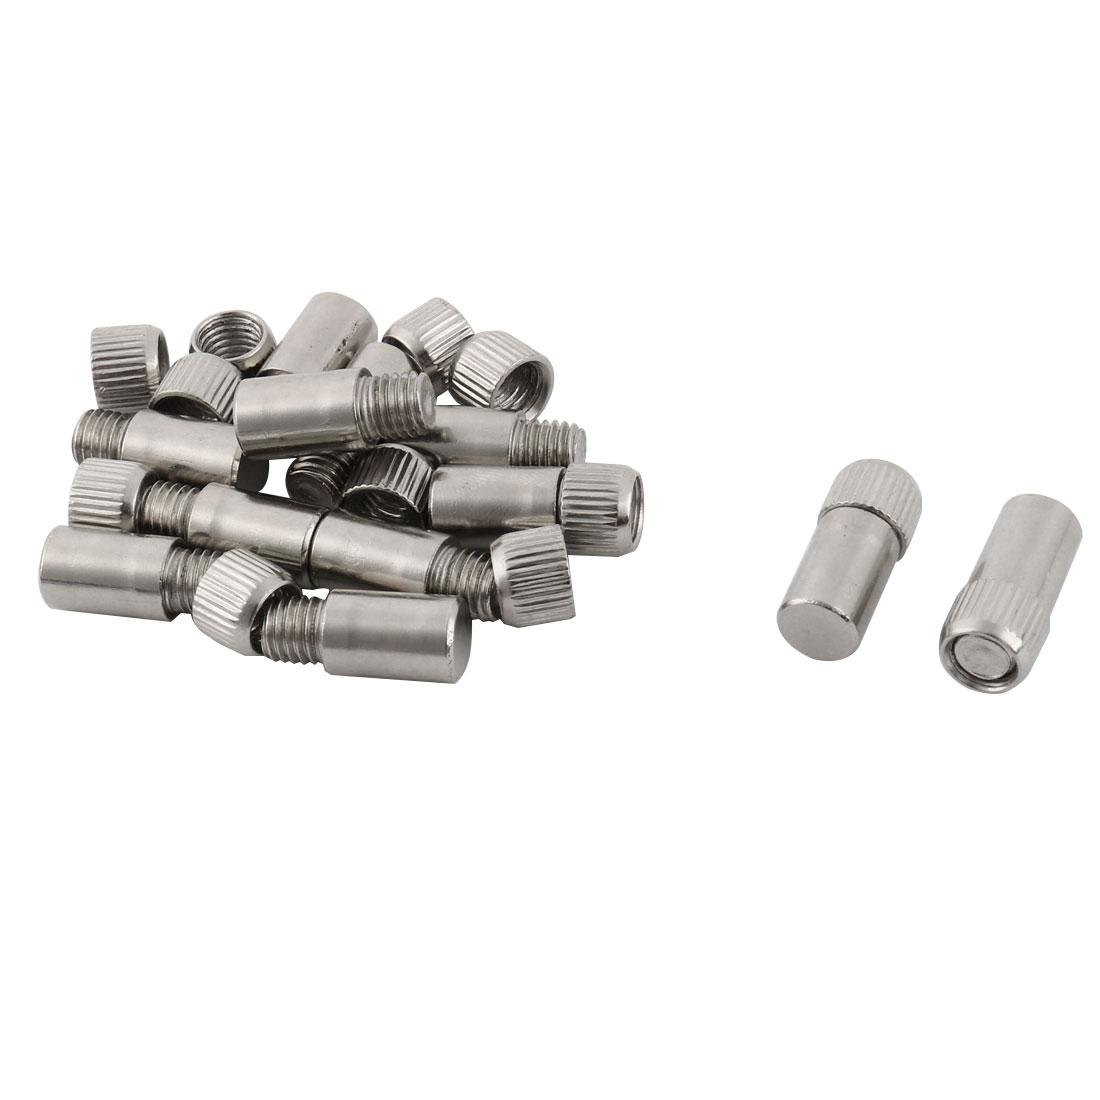 Household Metal Furniture Cabinet Cupboard Support Shelf Pin Peg 9mm Dia 12 Pcs